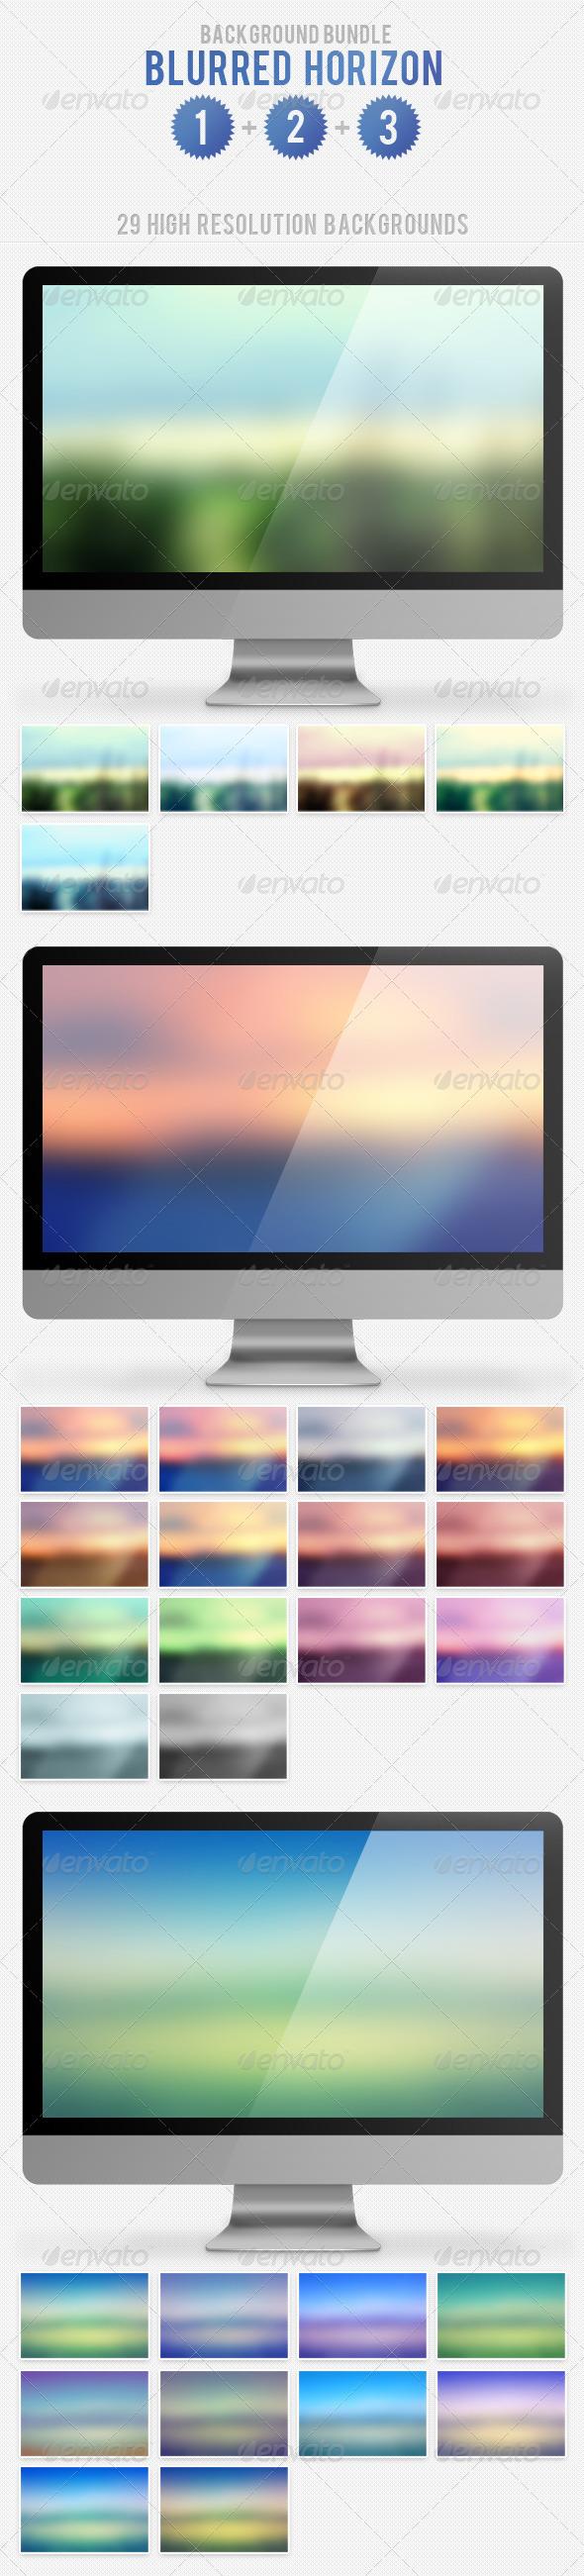 Blurred Horizon Background Bundle - Nature Backgrounds